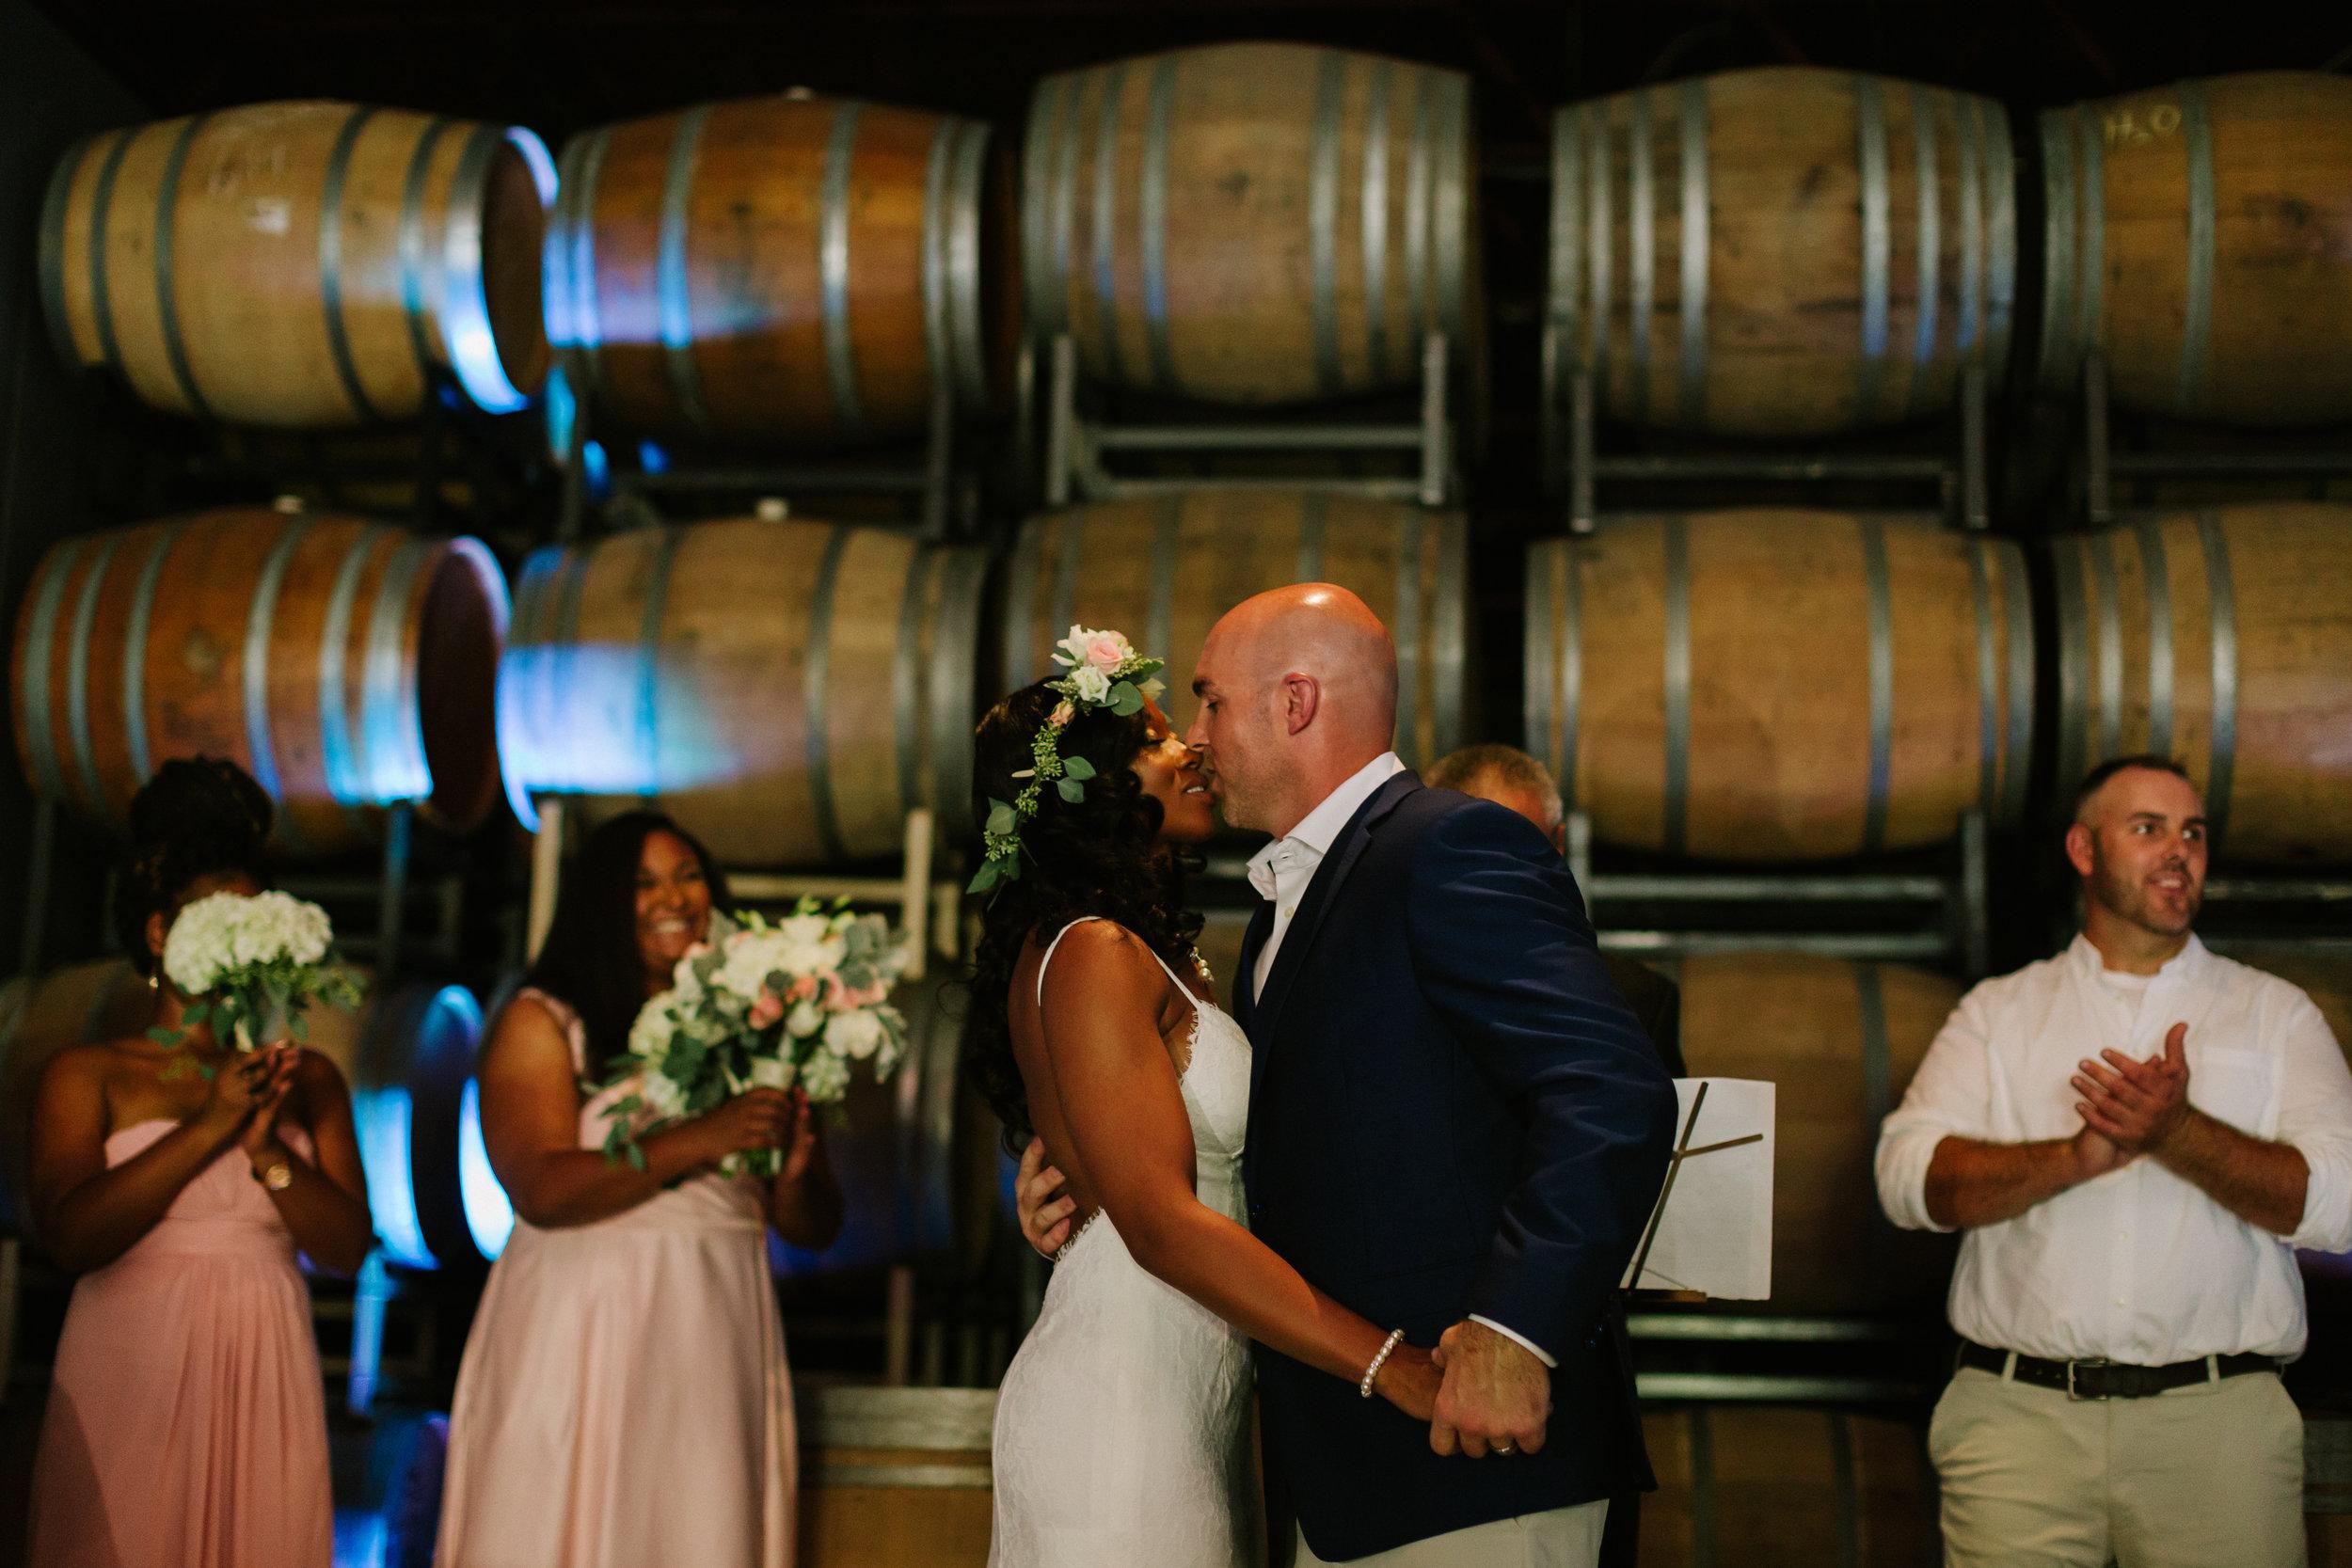 2017.09.16 Ashley and Chuck O'Day Quantam Leap Winery Wedding (179 of 462).jpg